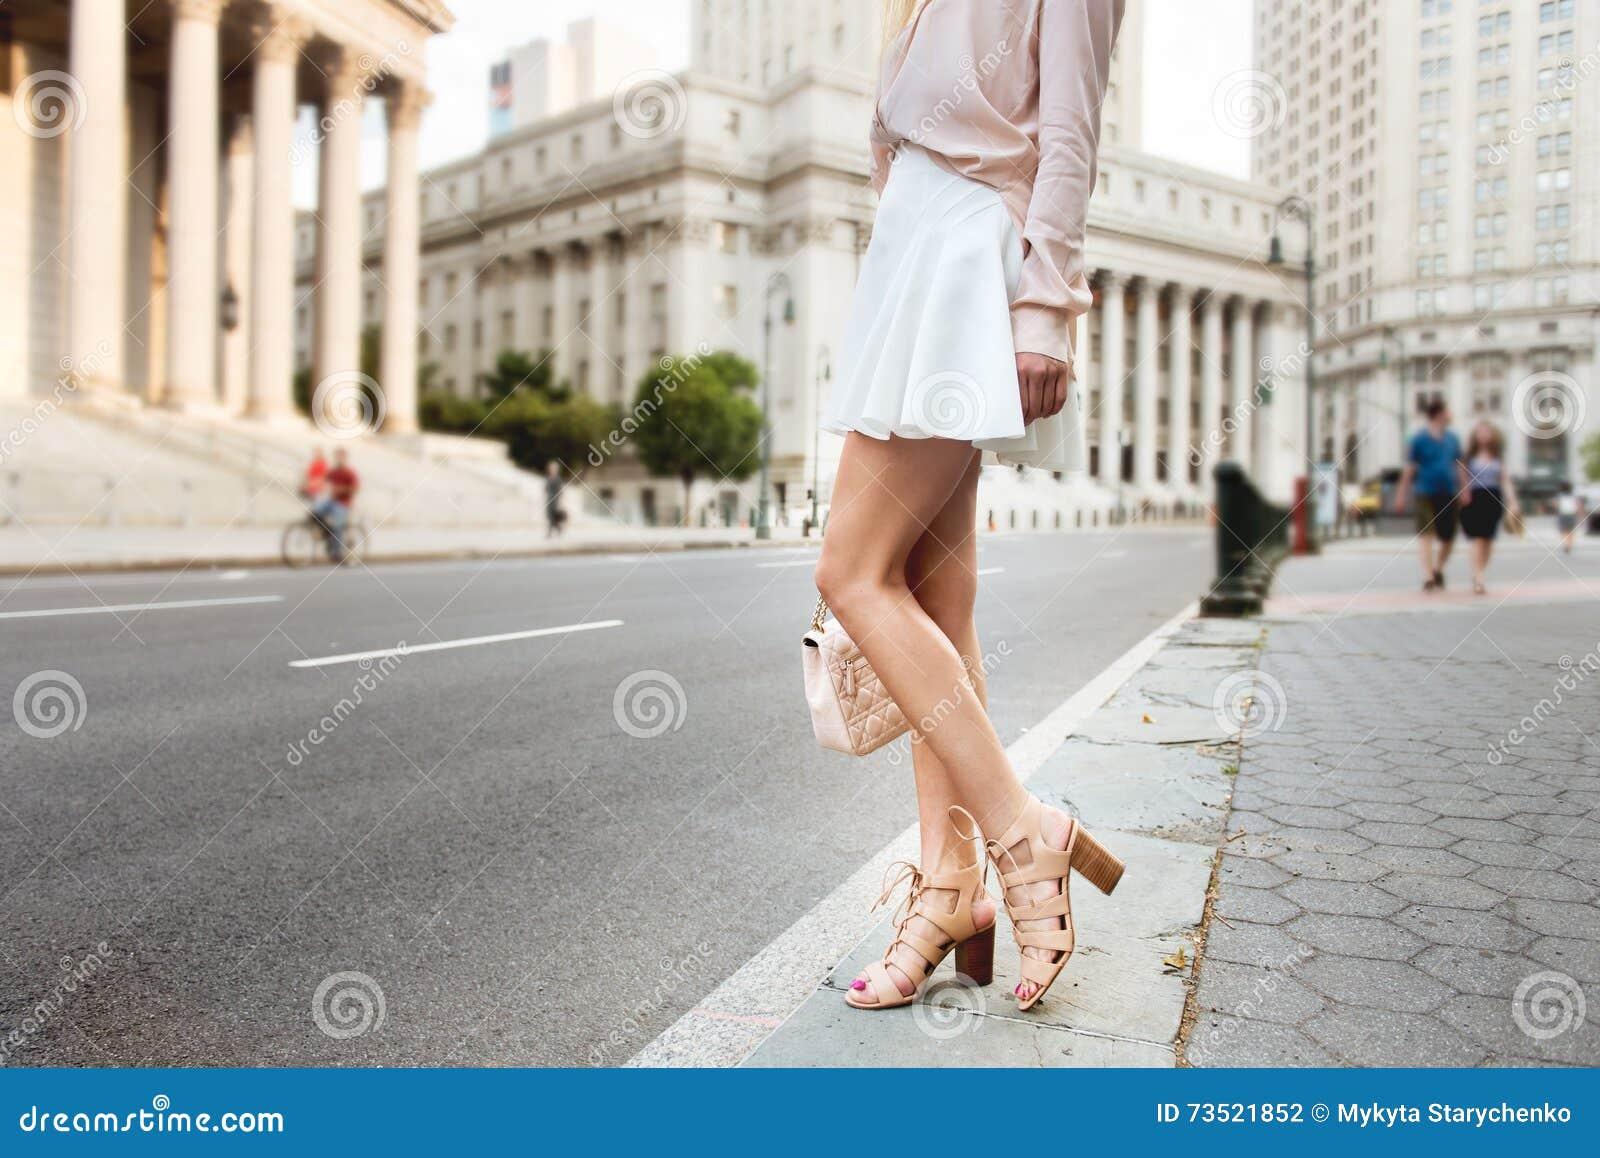 Женские ноги на улице видео фото 507-951